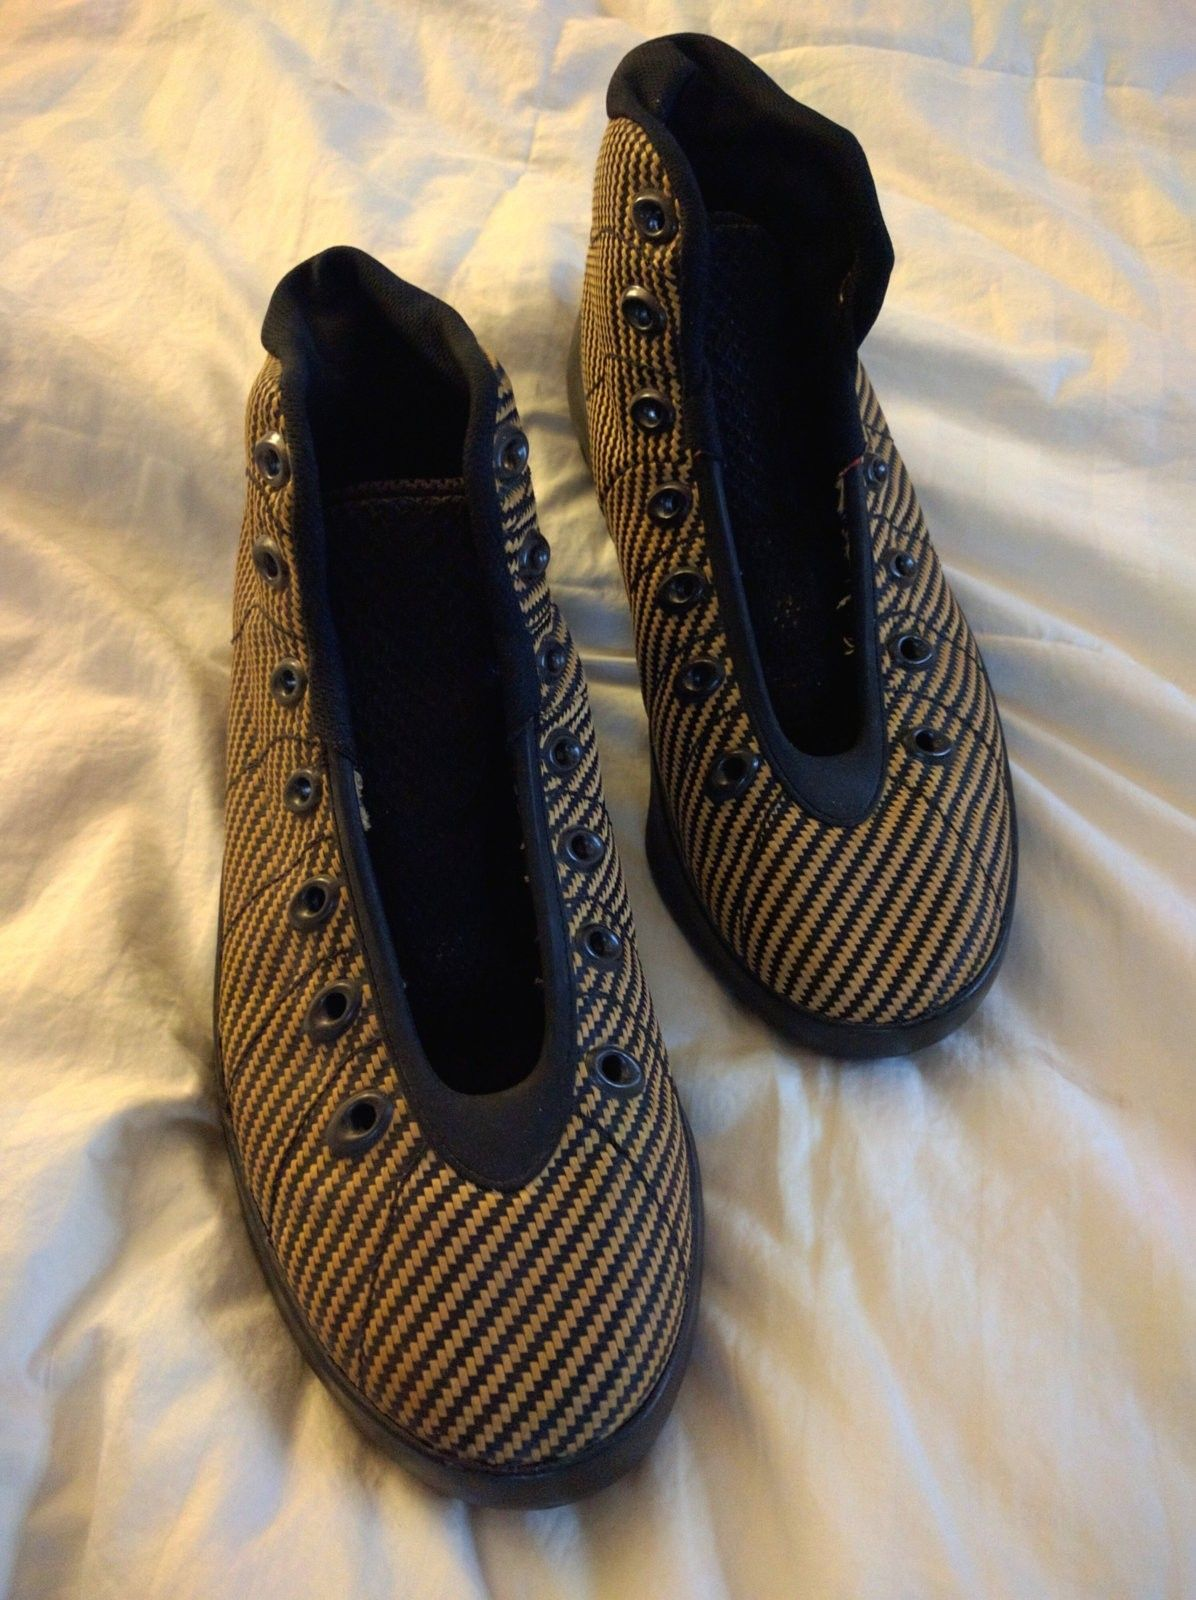 Shoe One(s) - Shoe One Yellow Hightop.jpg